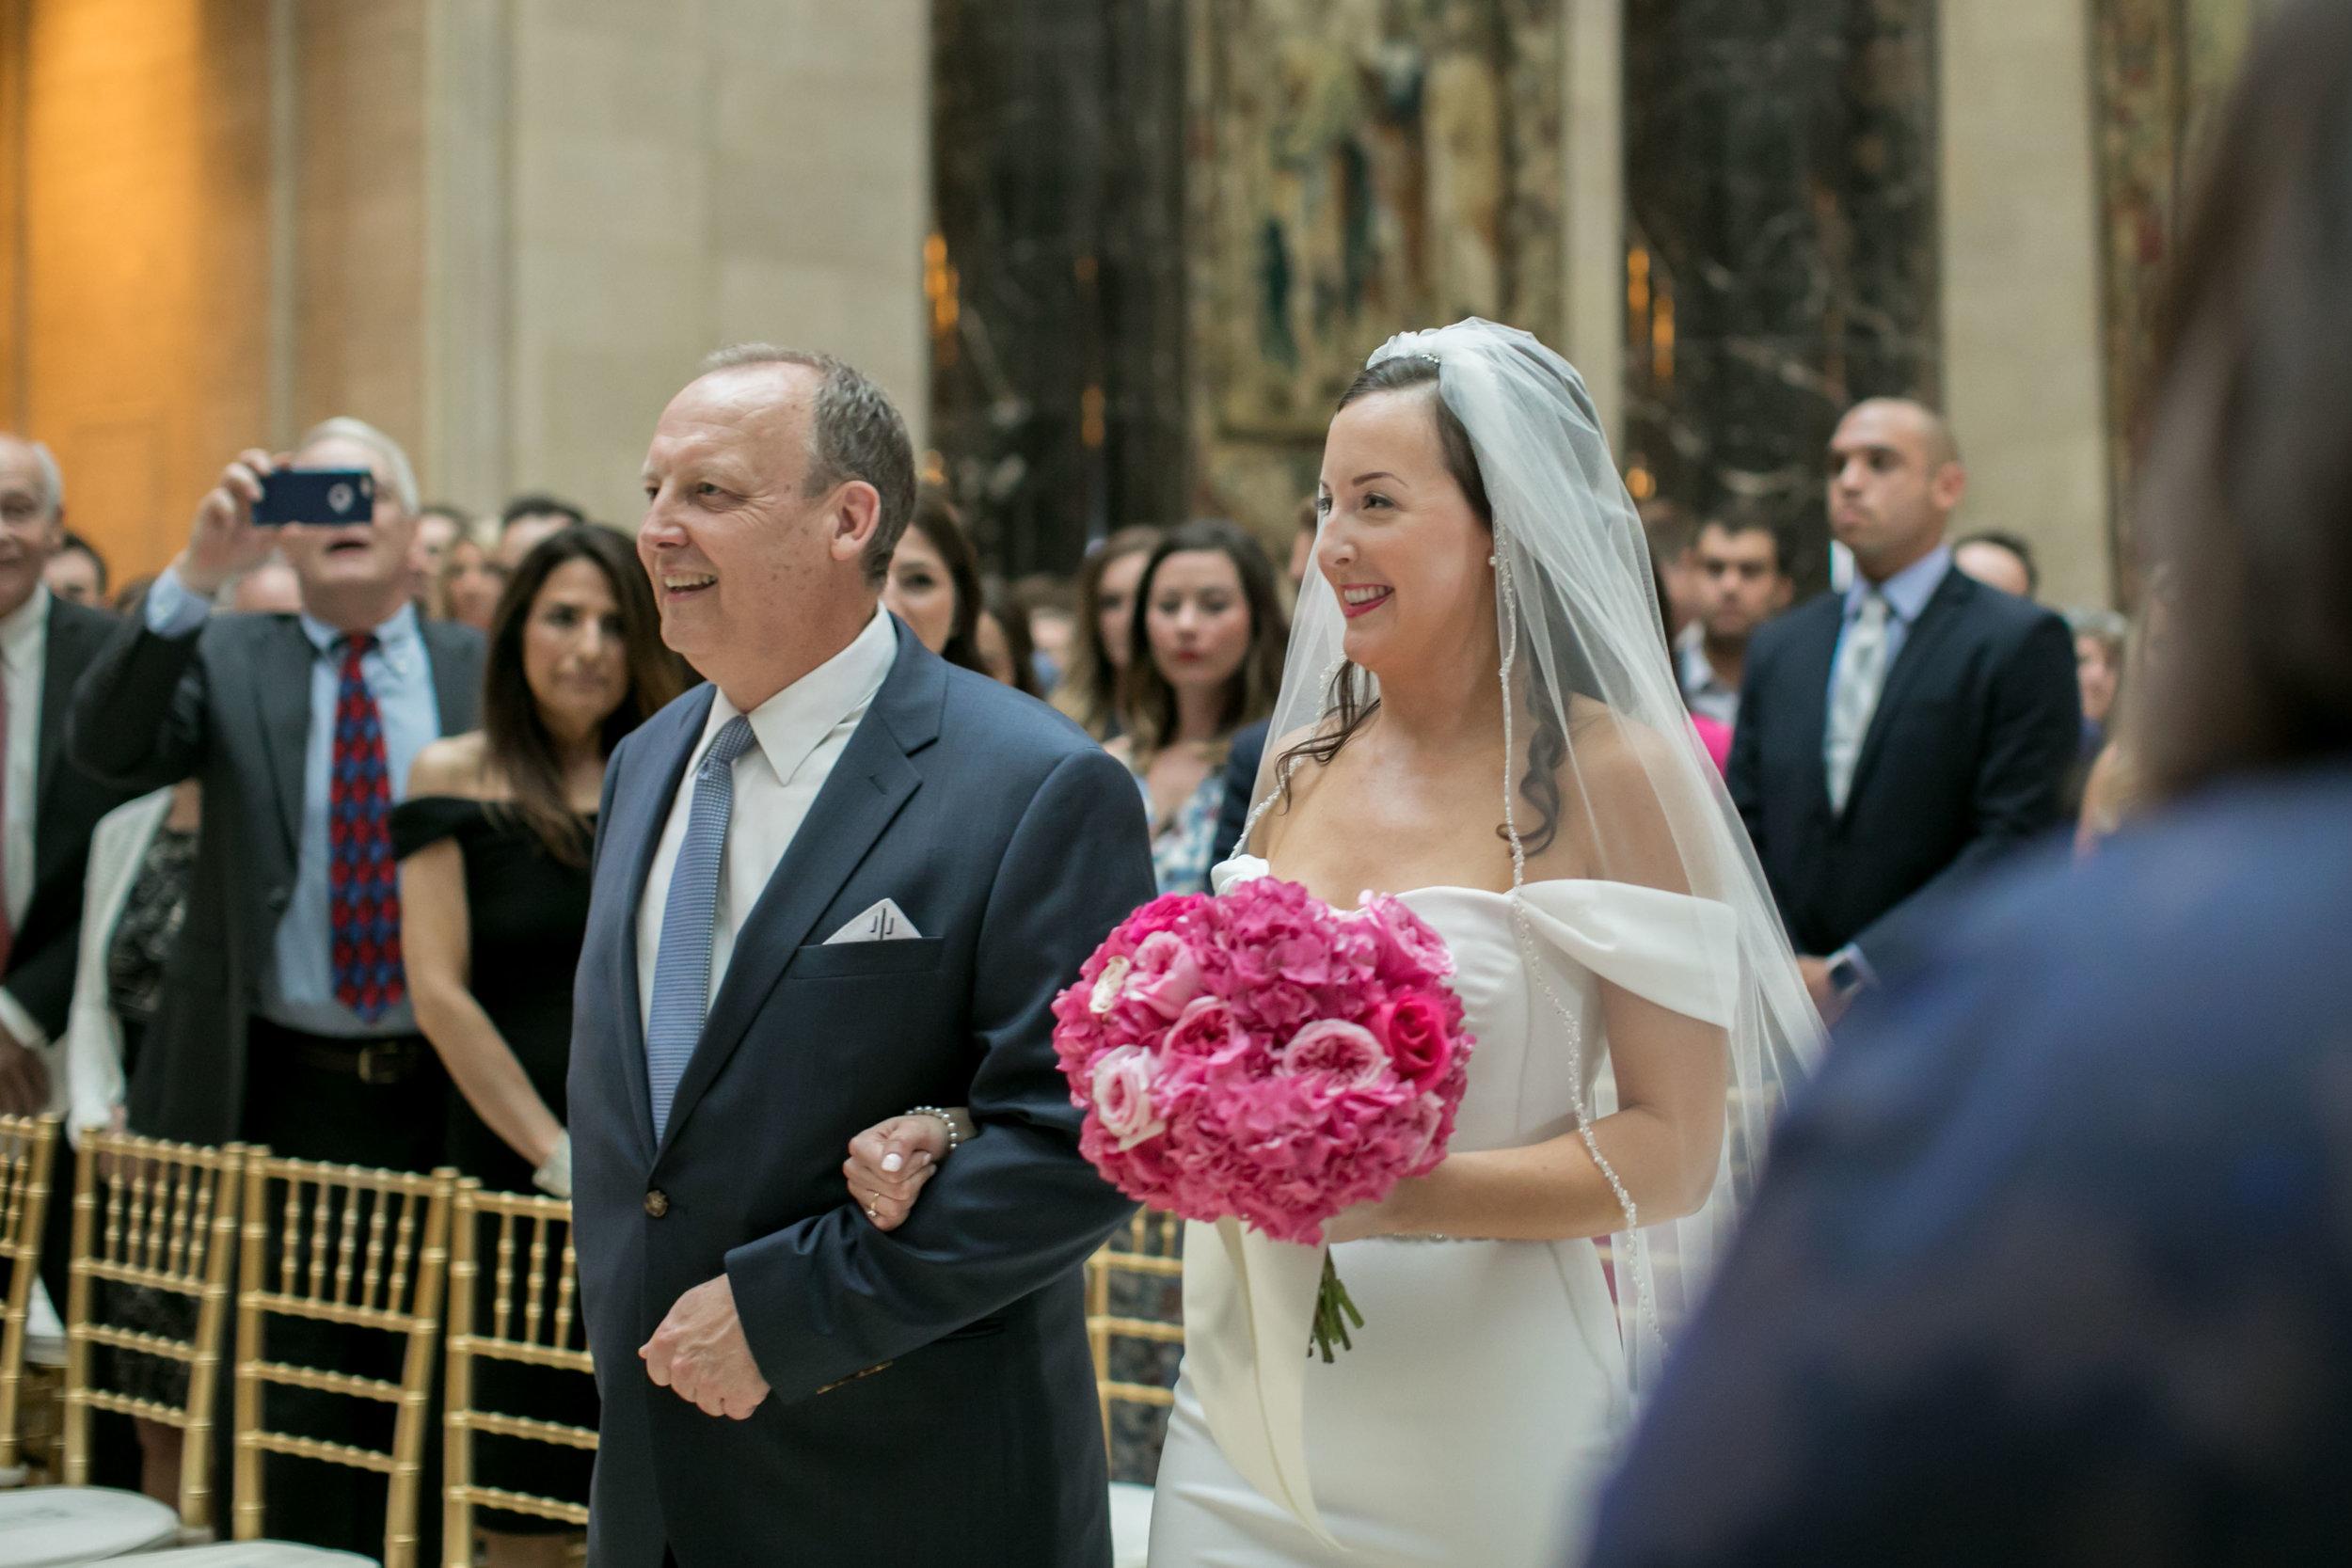 nelson-atkins-wedding-36.jpg